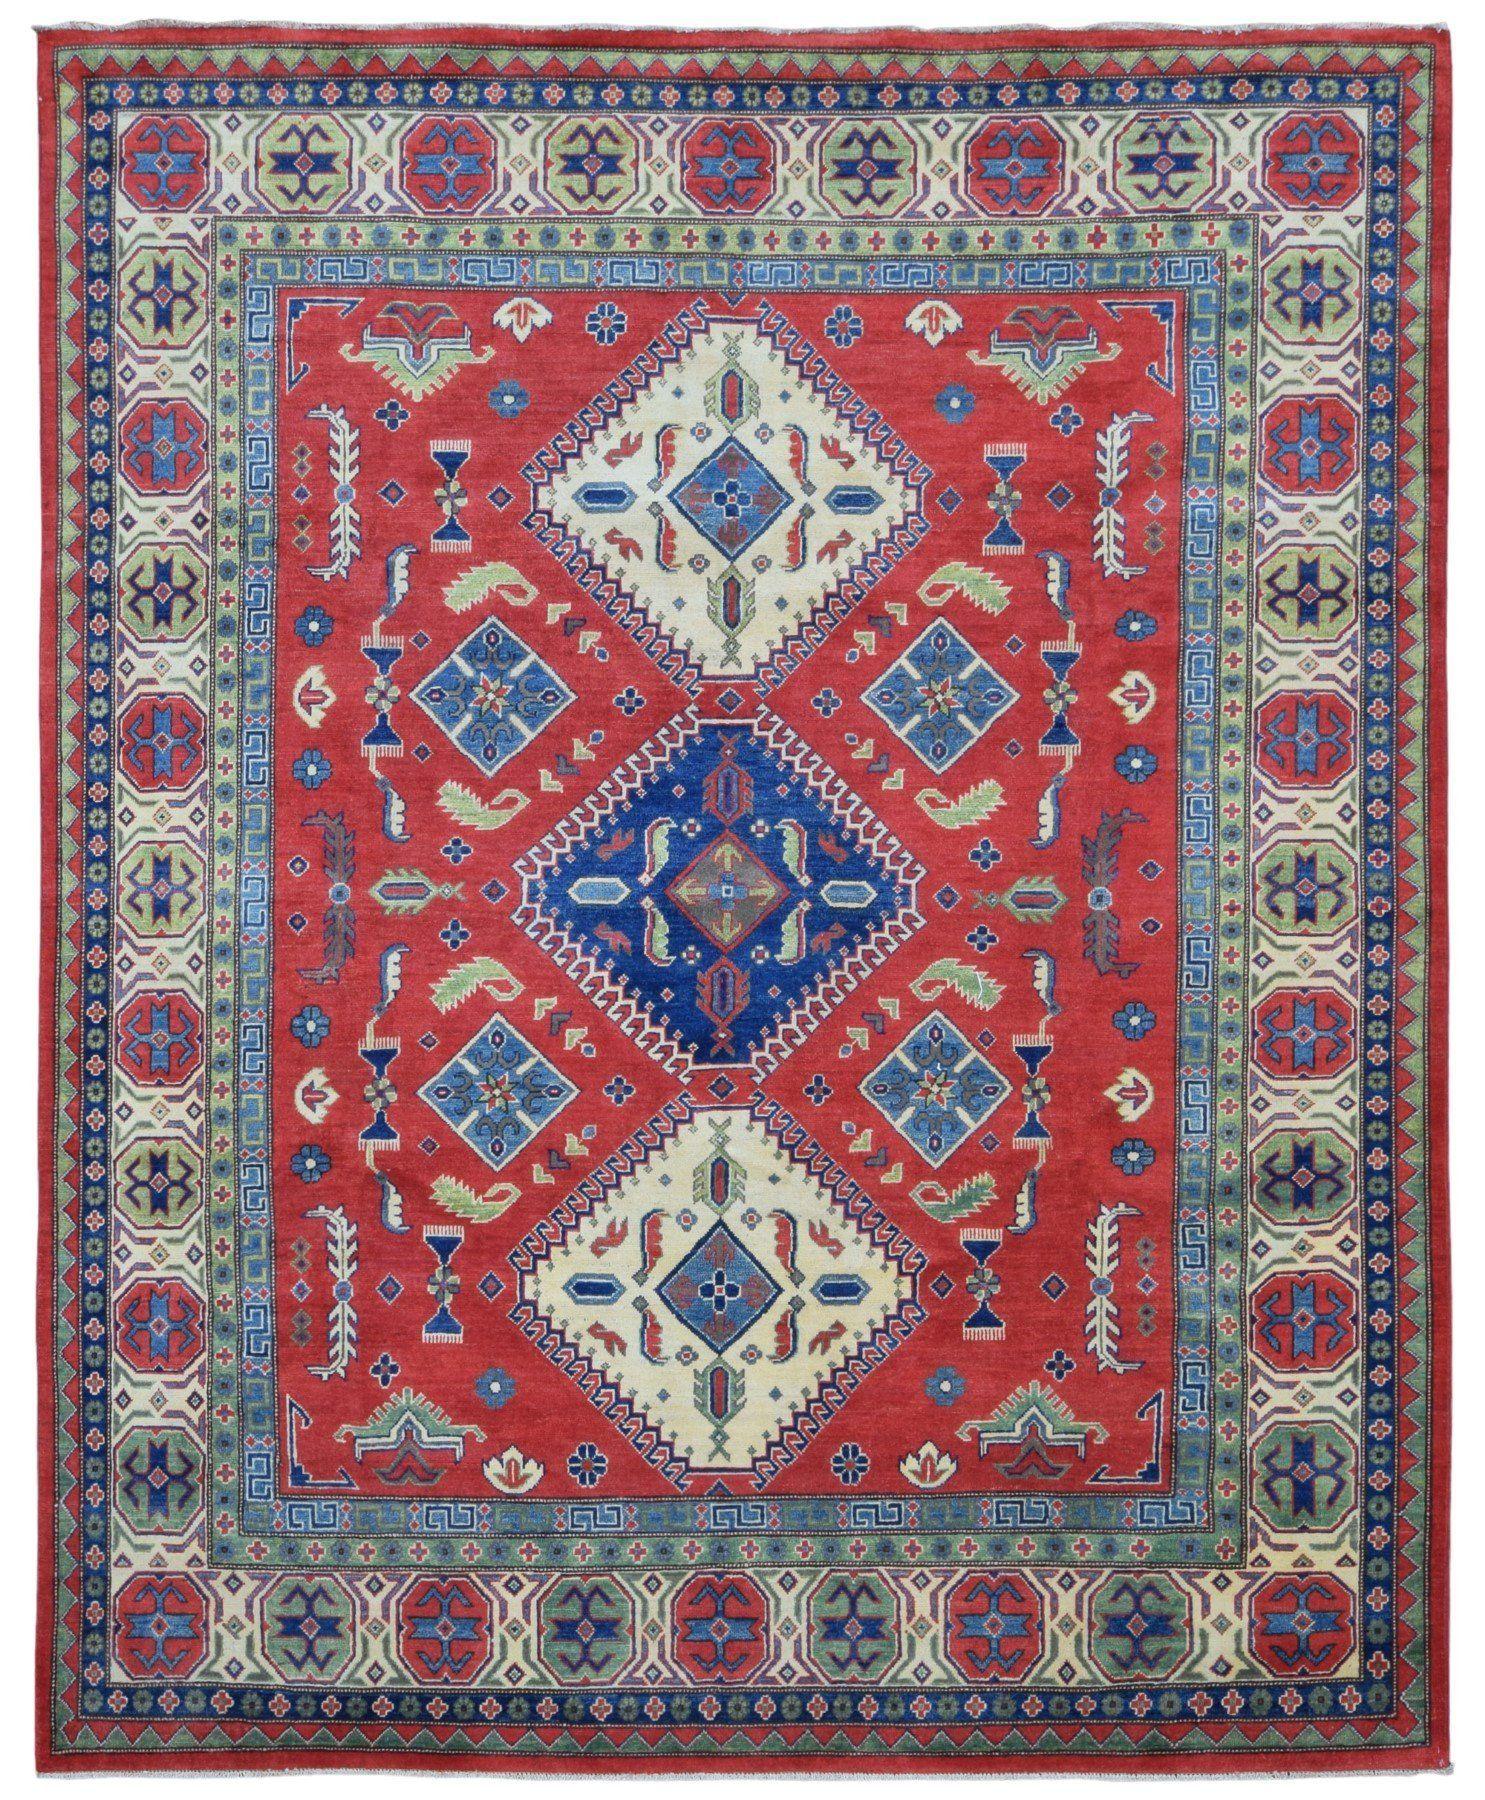 Fine Pakistan Kazak Large Oriental Rug 8'1X9'7